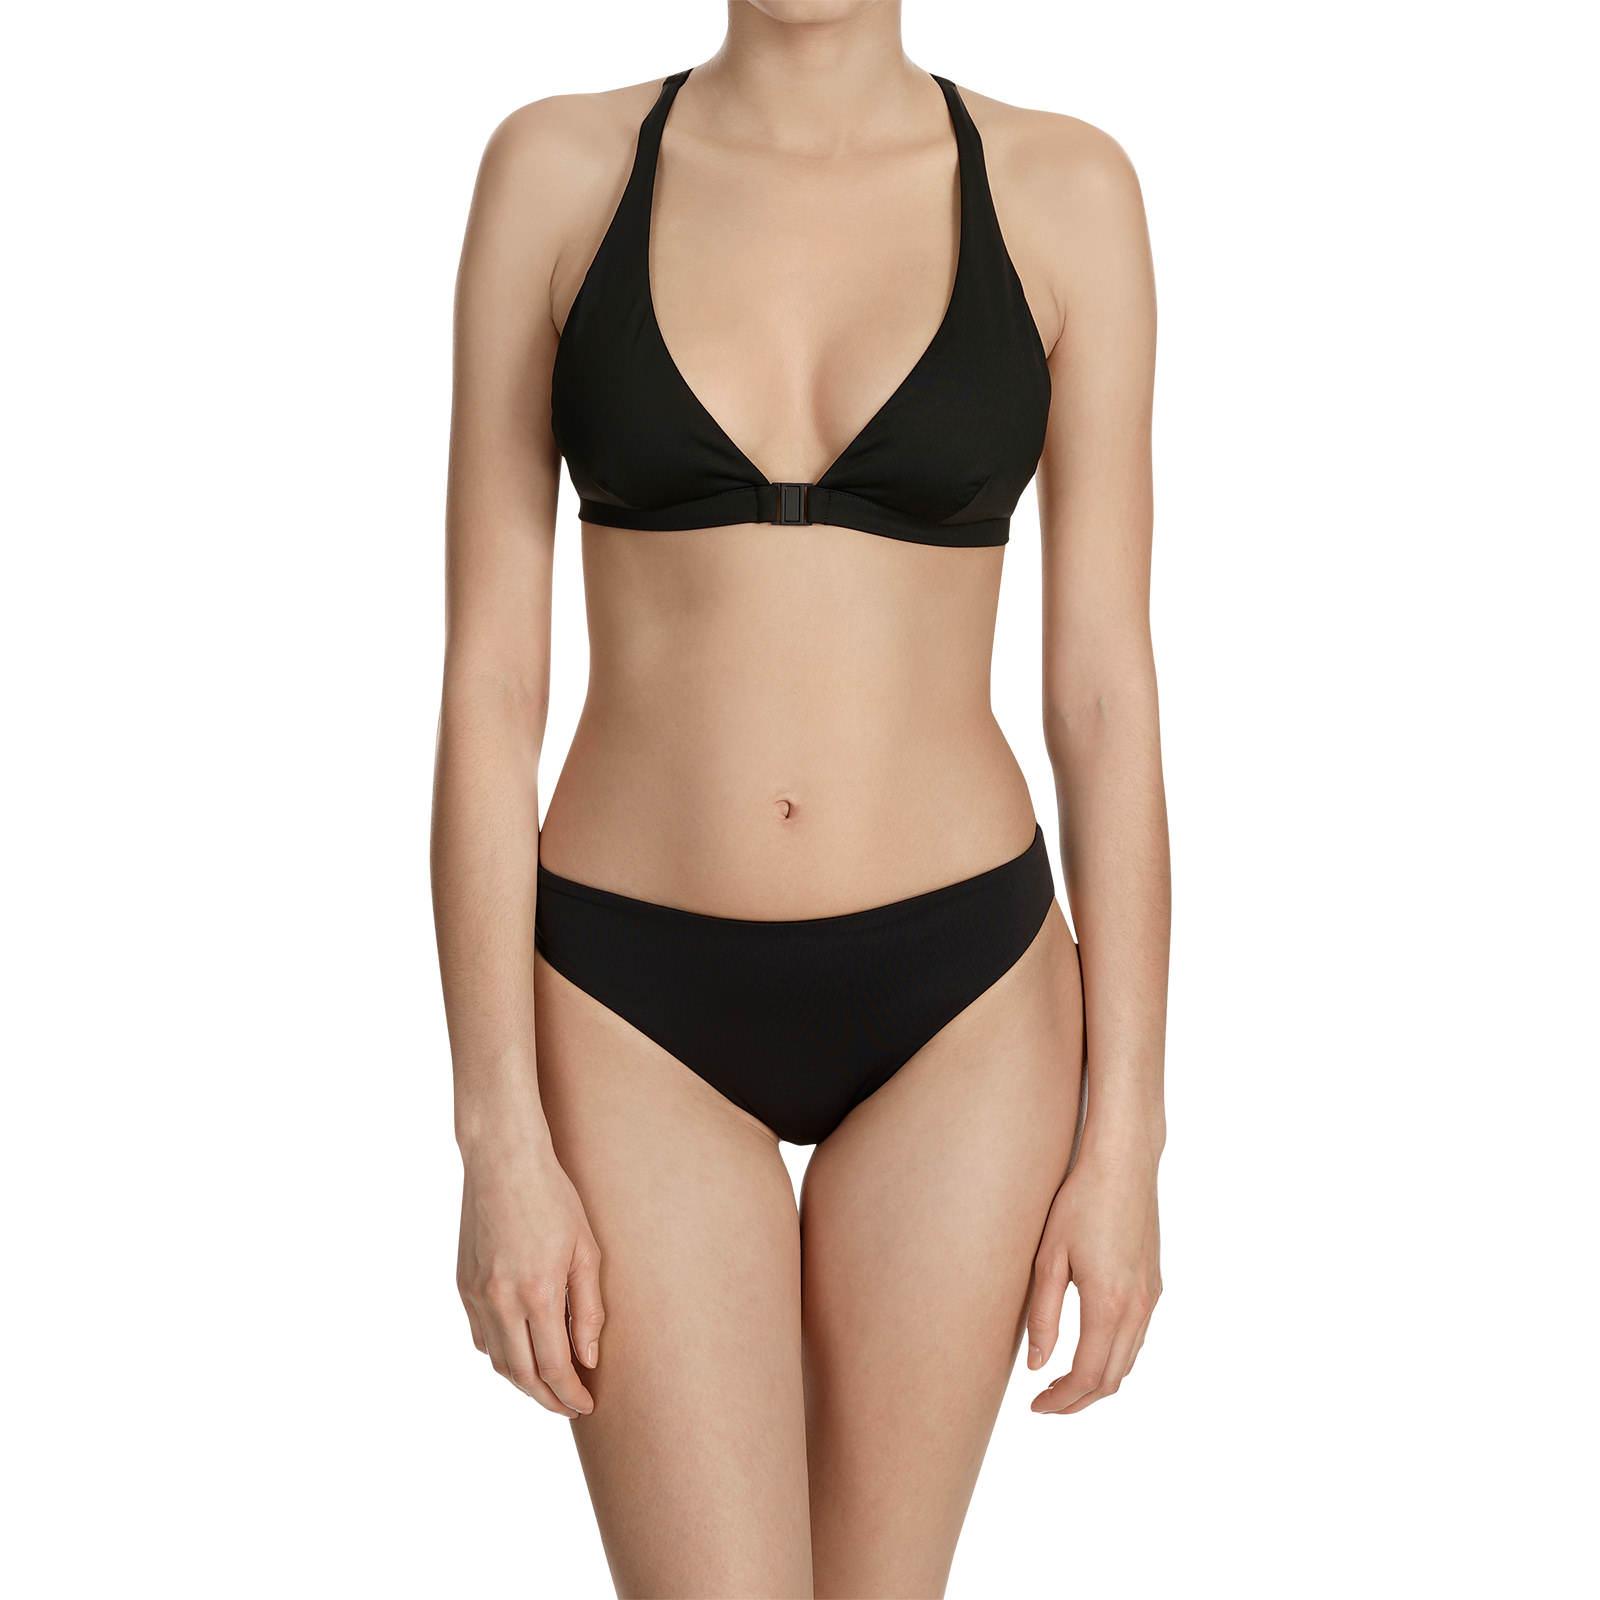 bikini unterteil season basic in schwarz bademode bikini hose slip. Black Bedroom Furniture Sets. Home Design Ideas